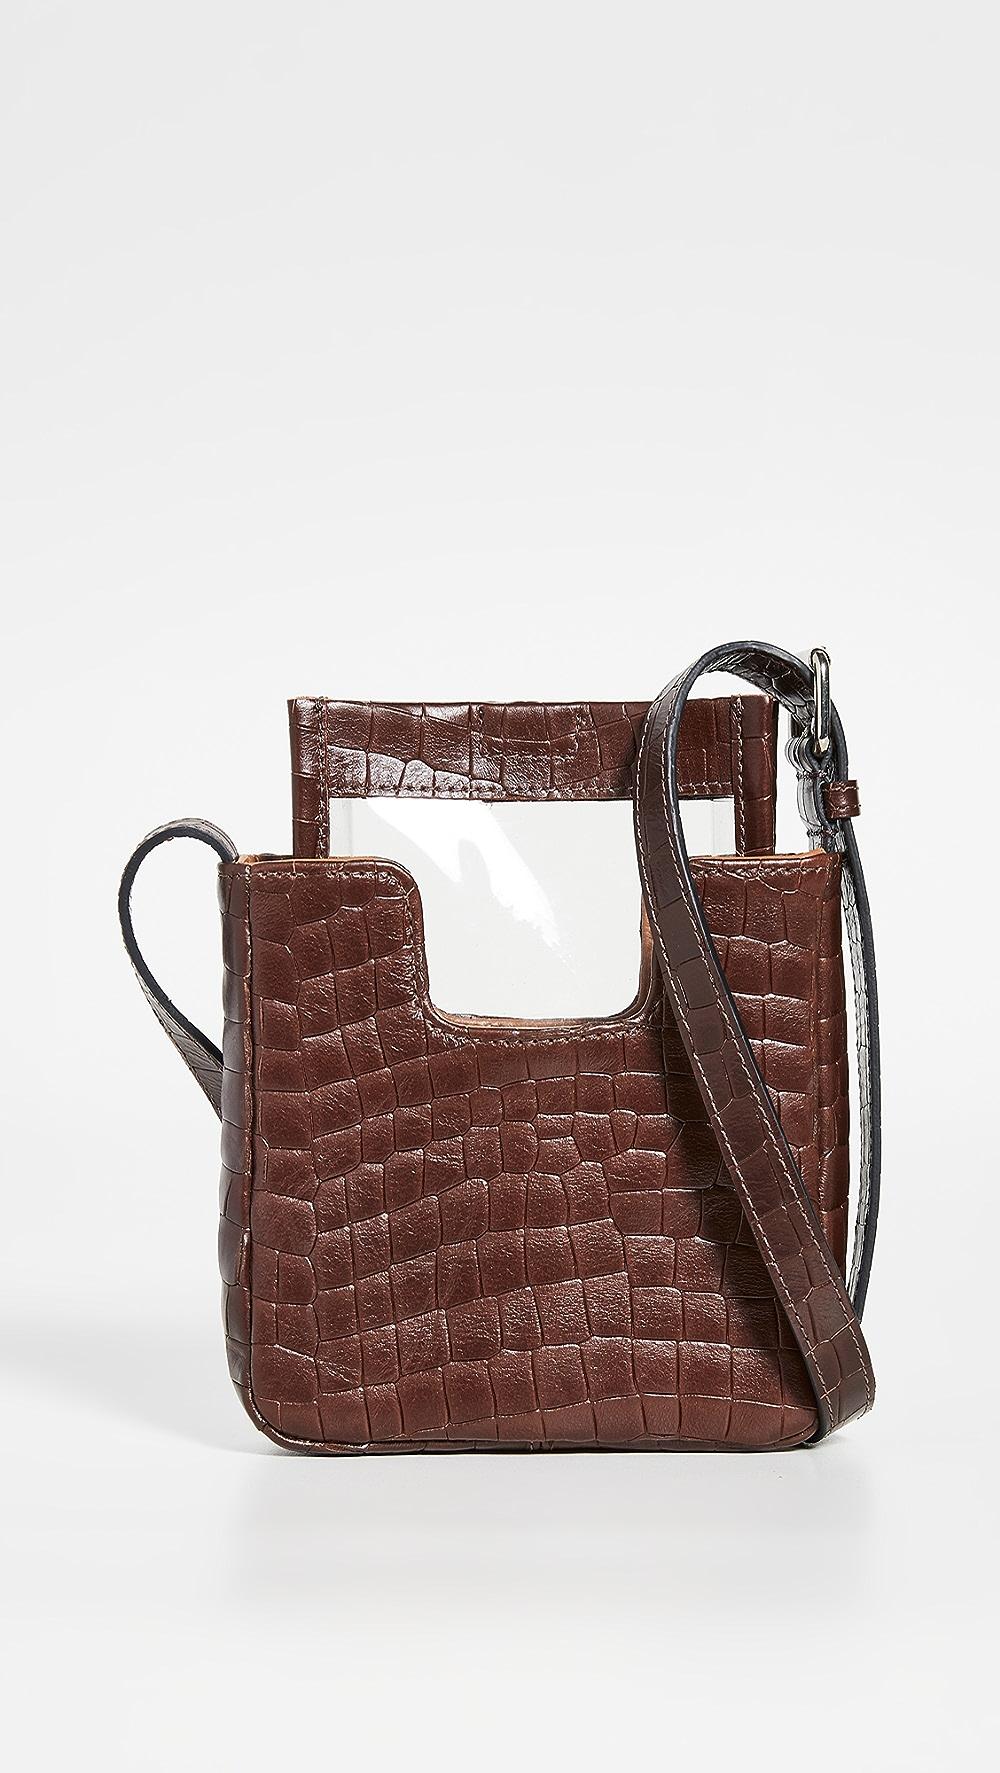 2019 New Style Alfeya Valrina - Alea Bag Latest Technology